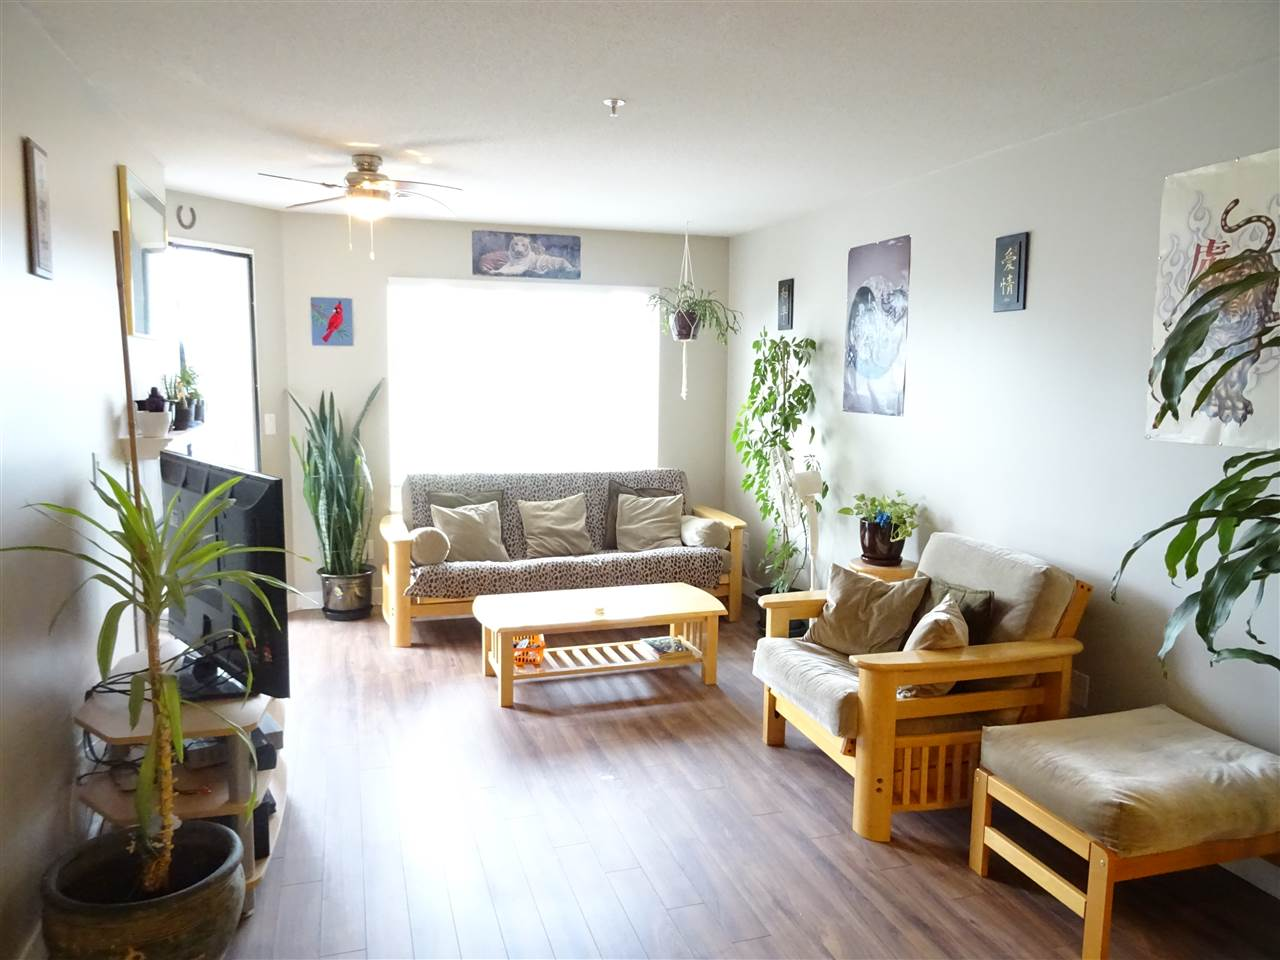 Condo Apartment at 402 5765 GLOVER ROAD, Unit 402, Langley, British Columbia. Image 12